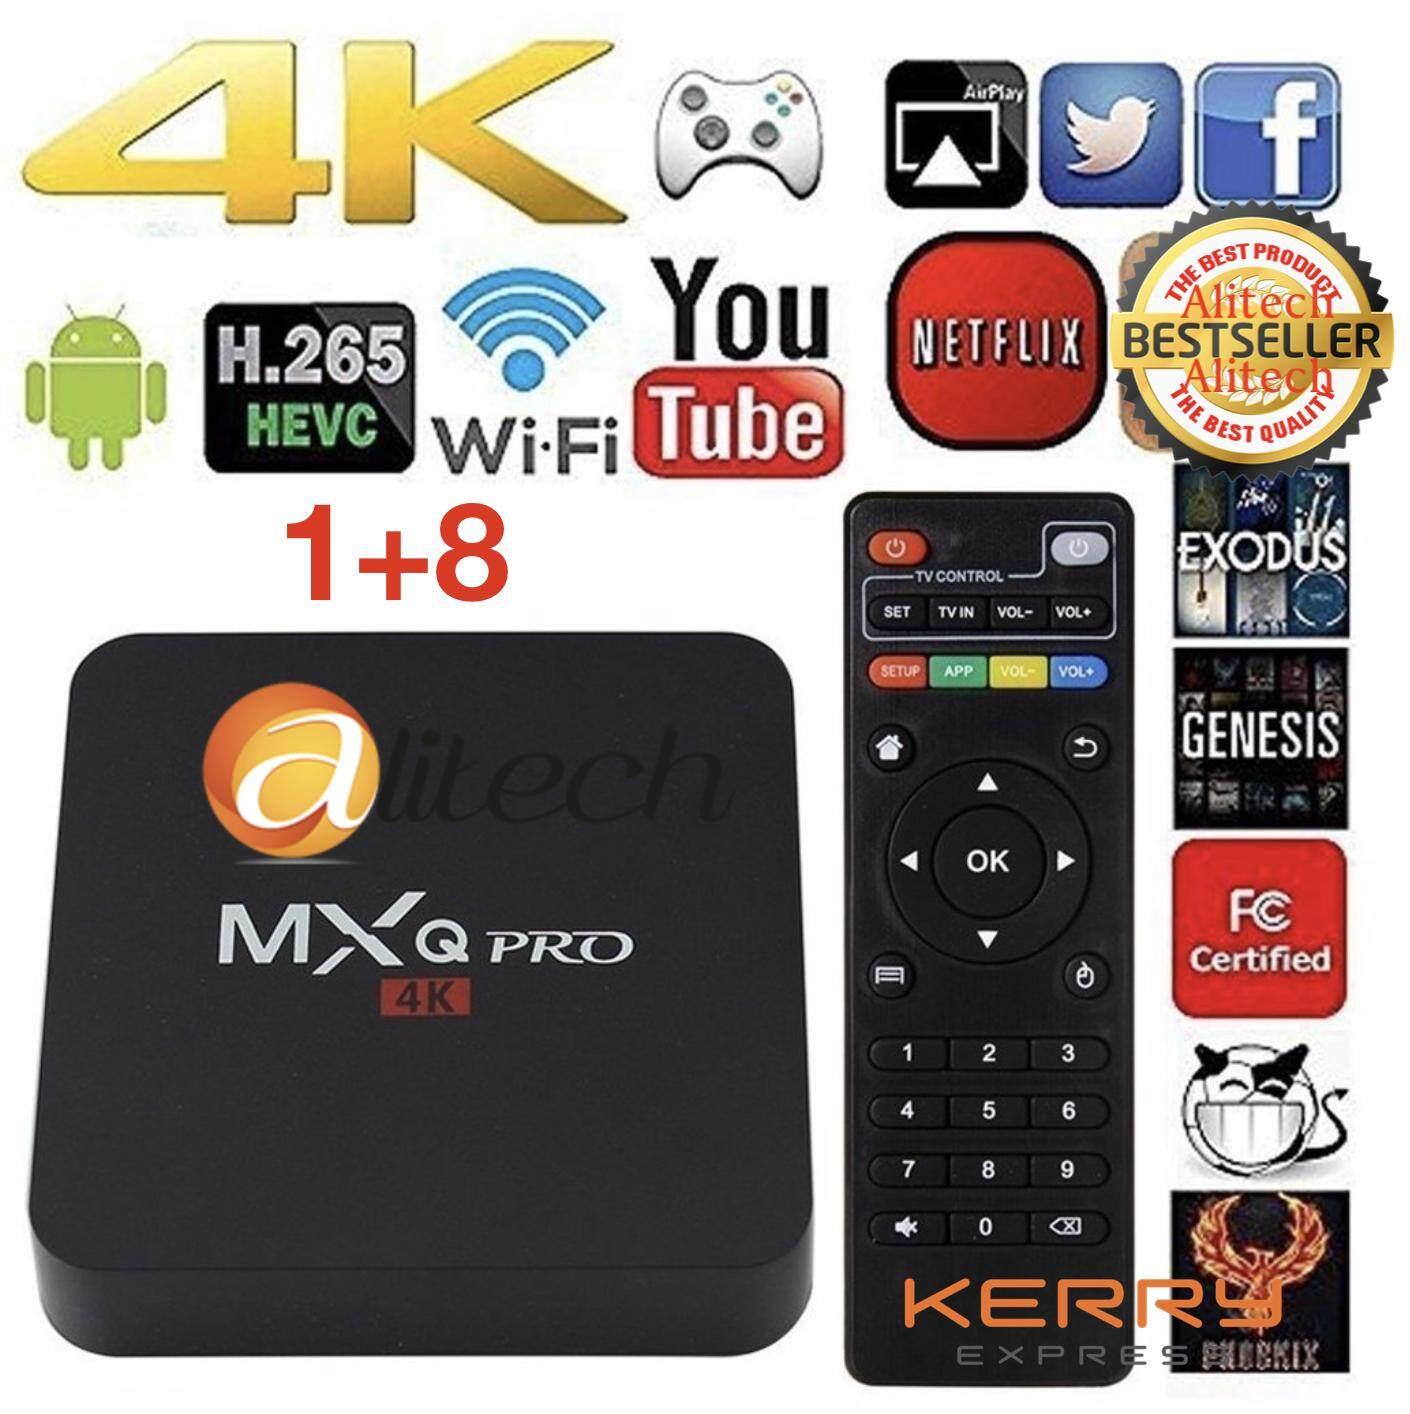 Alitech MXQ PRO 4K กล่อง Andriod Smart TV รุ่นใหม่อัพเกรดแอนดรอยด์ 7.1 / CPU 4x ARM Cortek-A7 1.50 GHz / RockChip H3 / Ram 1 GB Rom 8 GB / ดูหนัง ฟังเพลง เล่นเกม ดูฟรีทีวีออนไลน์ได้ทั่วโลก / เชื่อมต่อได้ทั้ง WIFI และ สาย Lan / รองรับ USB / พร้อมสาย HDMI